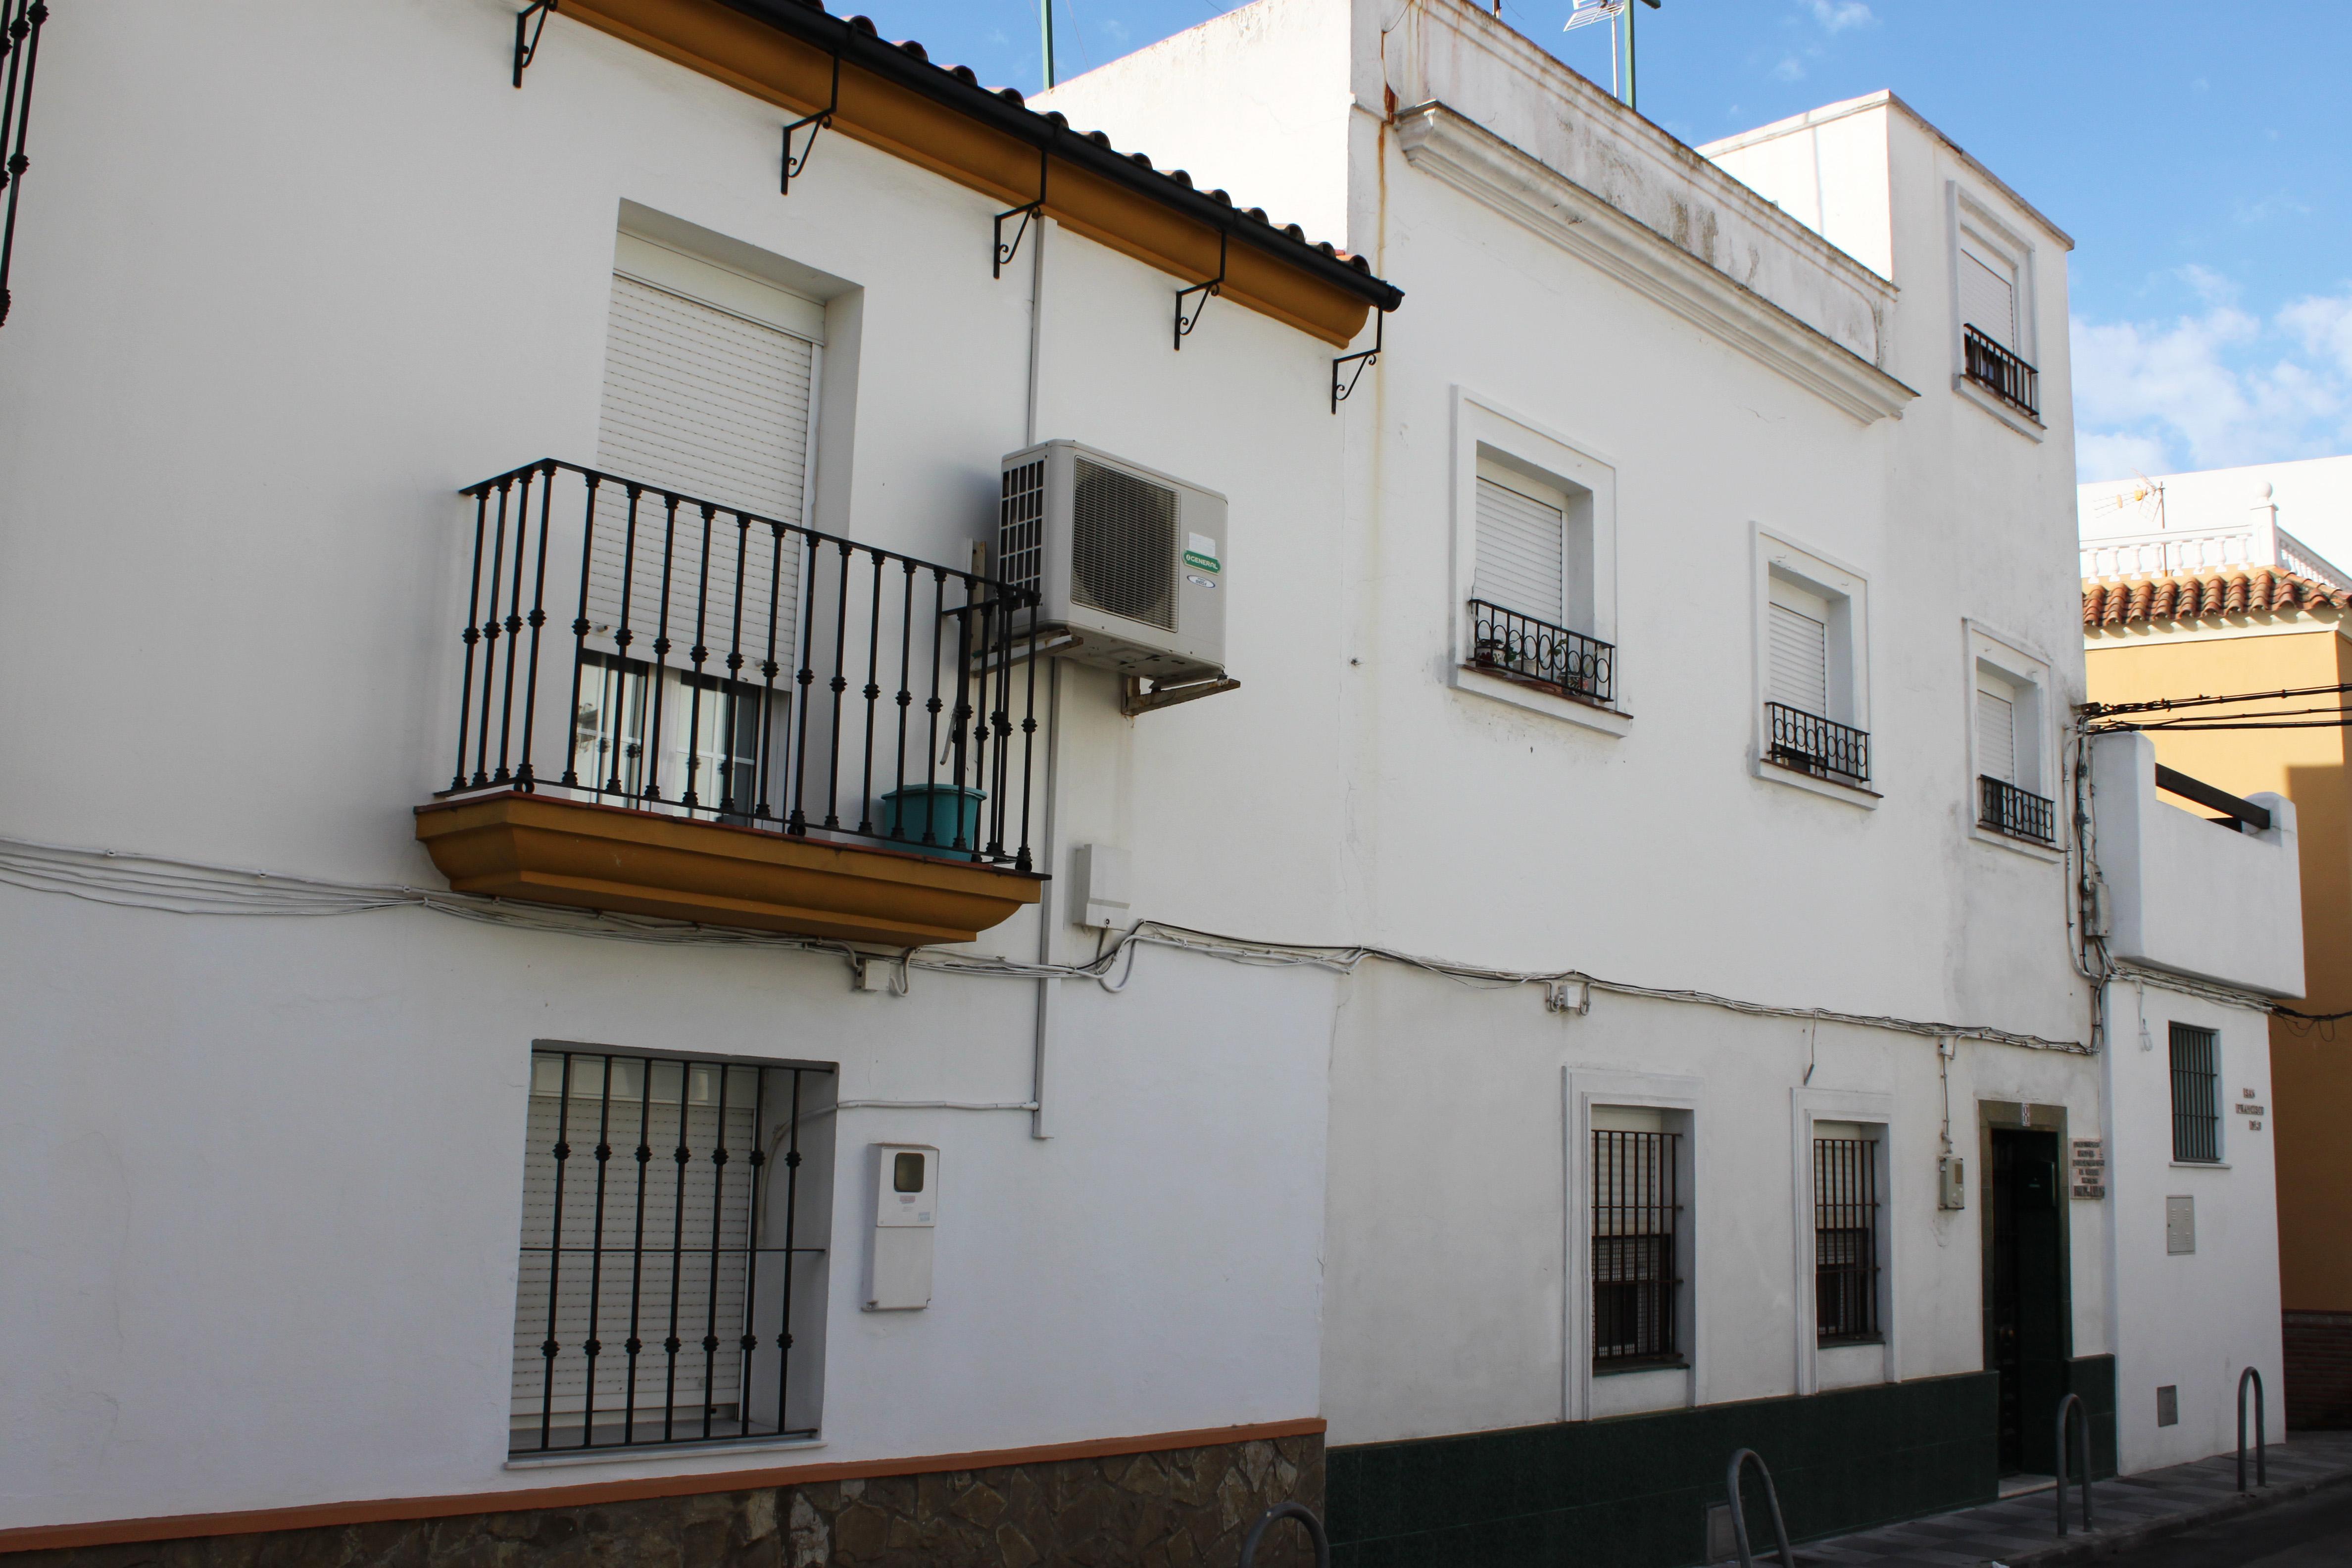 Casa natal de Paco de Lucía, número 8 de la calle San Francisco de Algeciras.